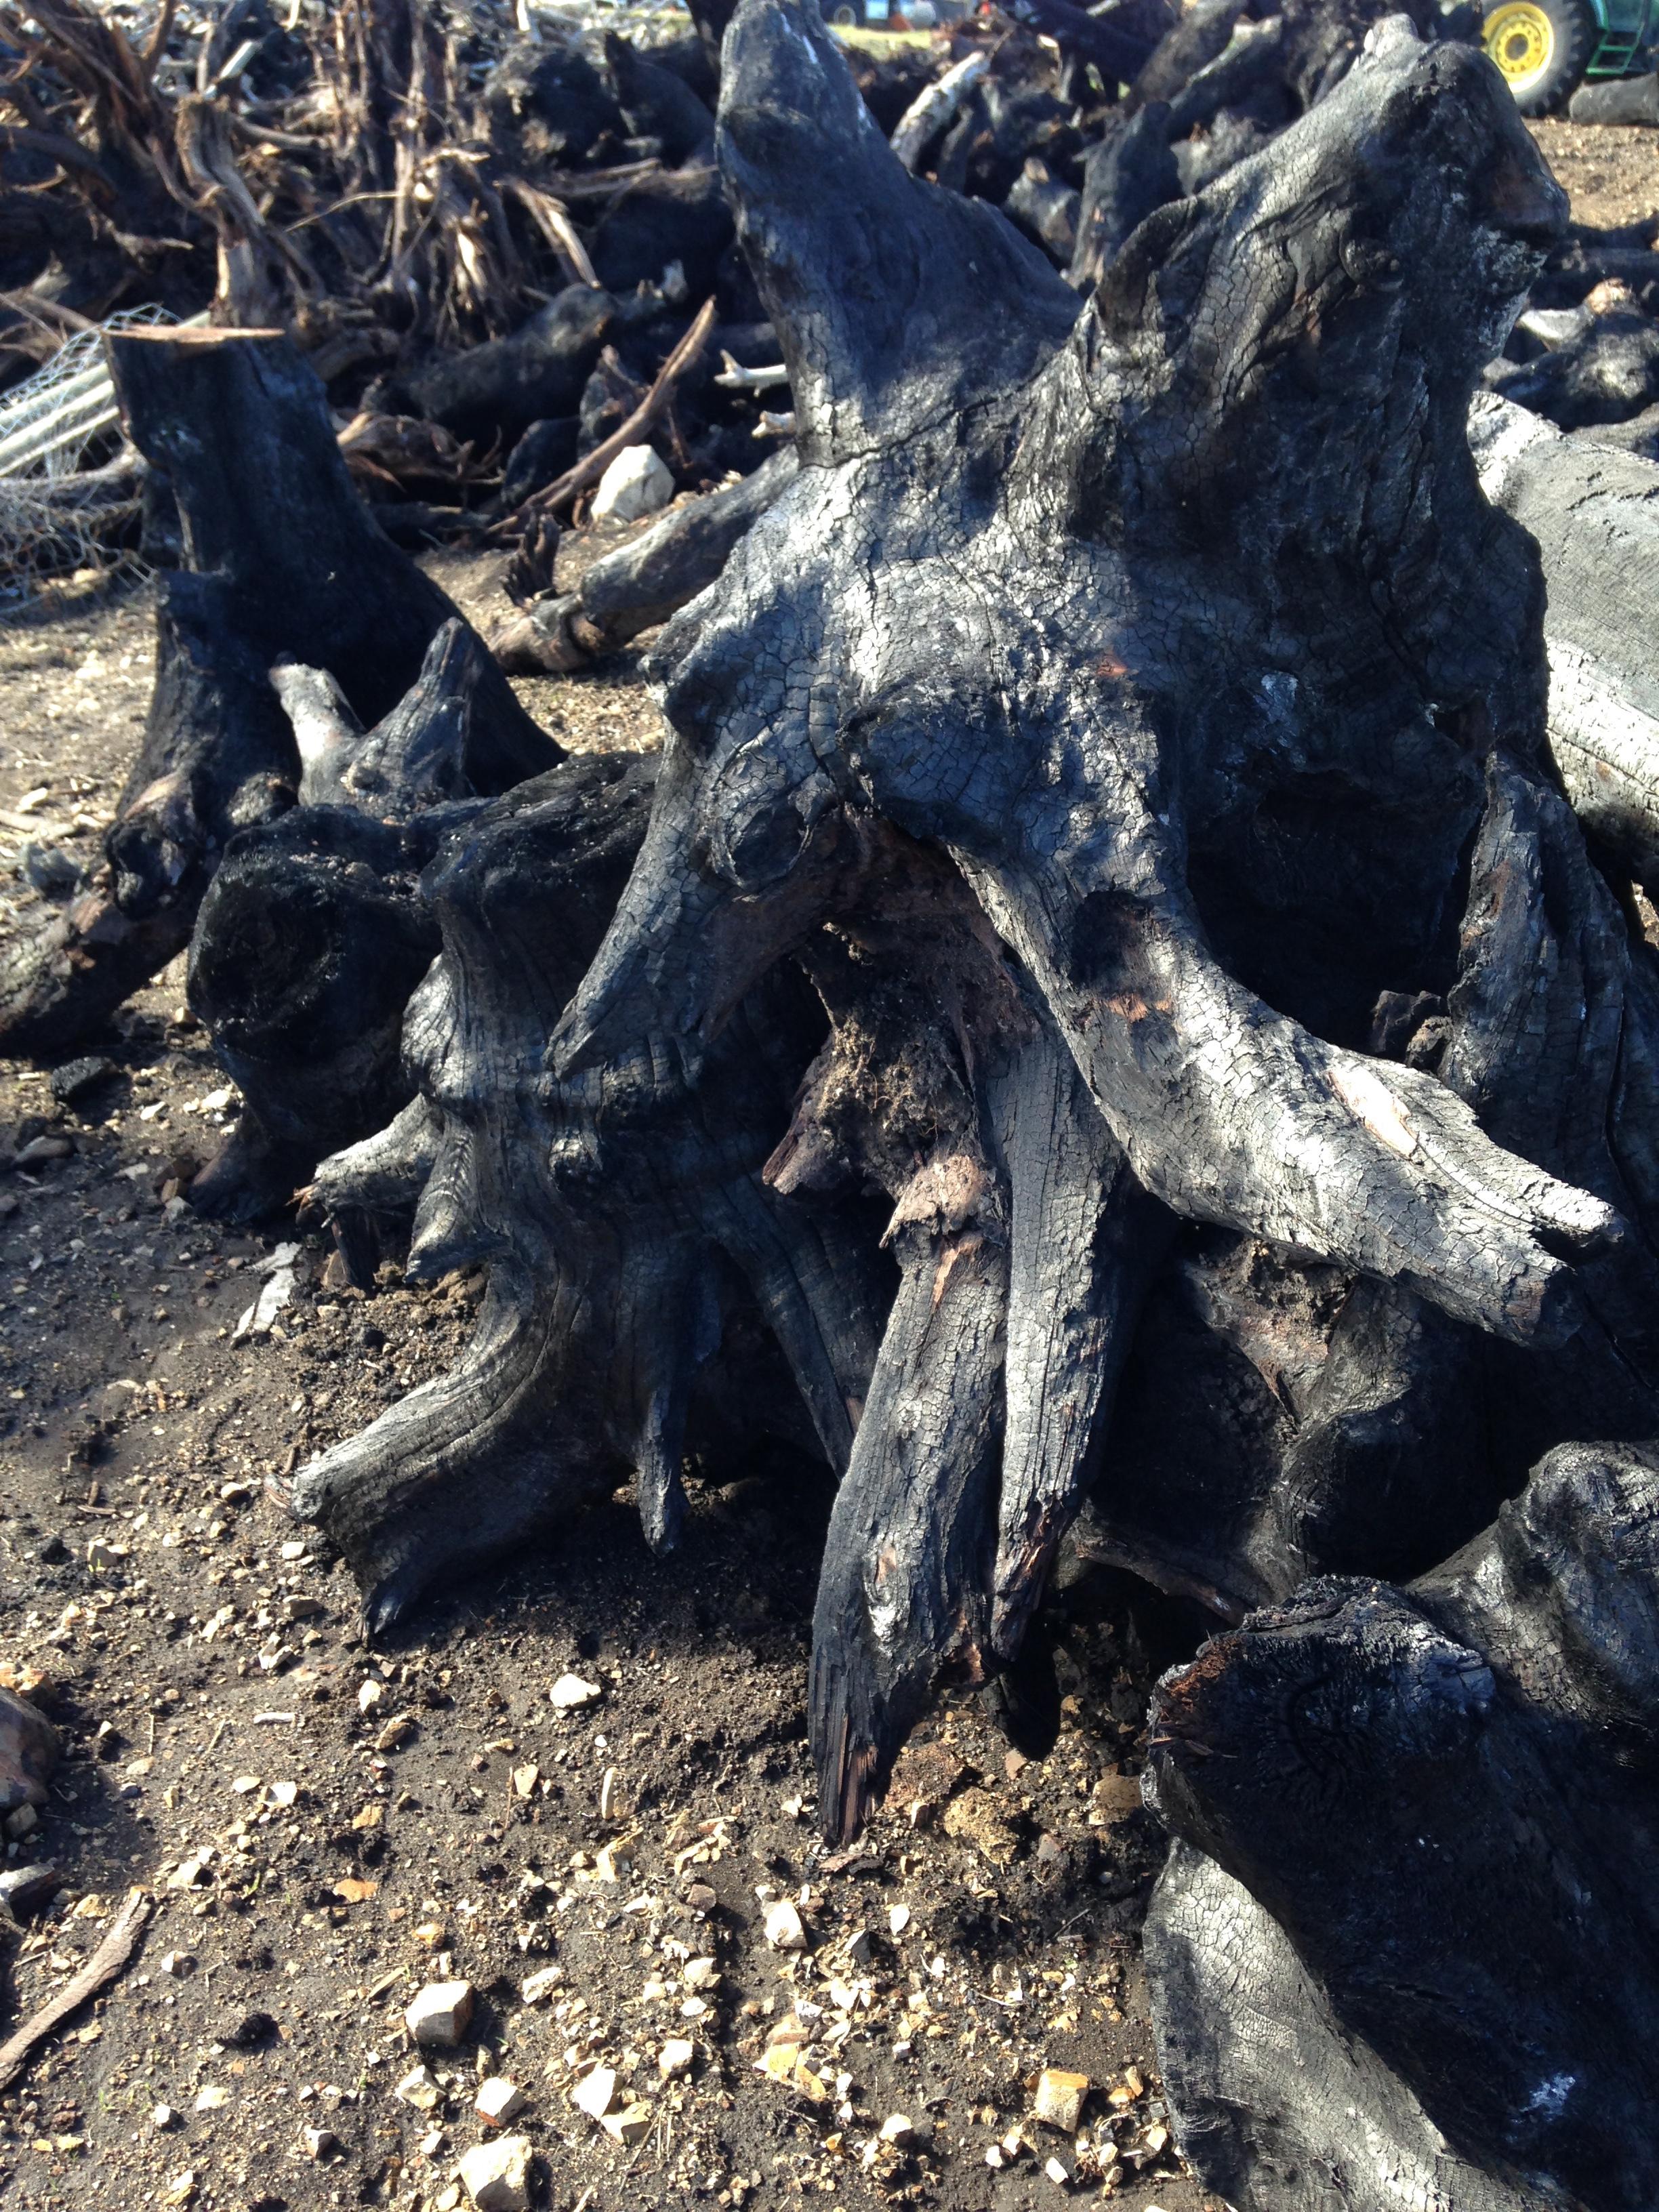 ben-riddering-charred-walnut-root-ball